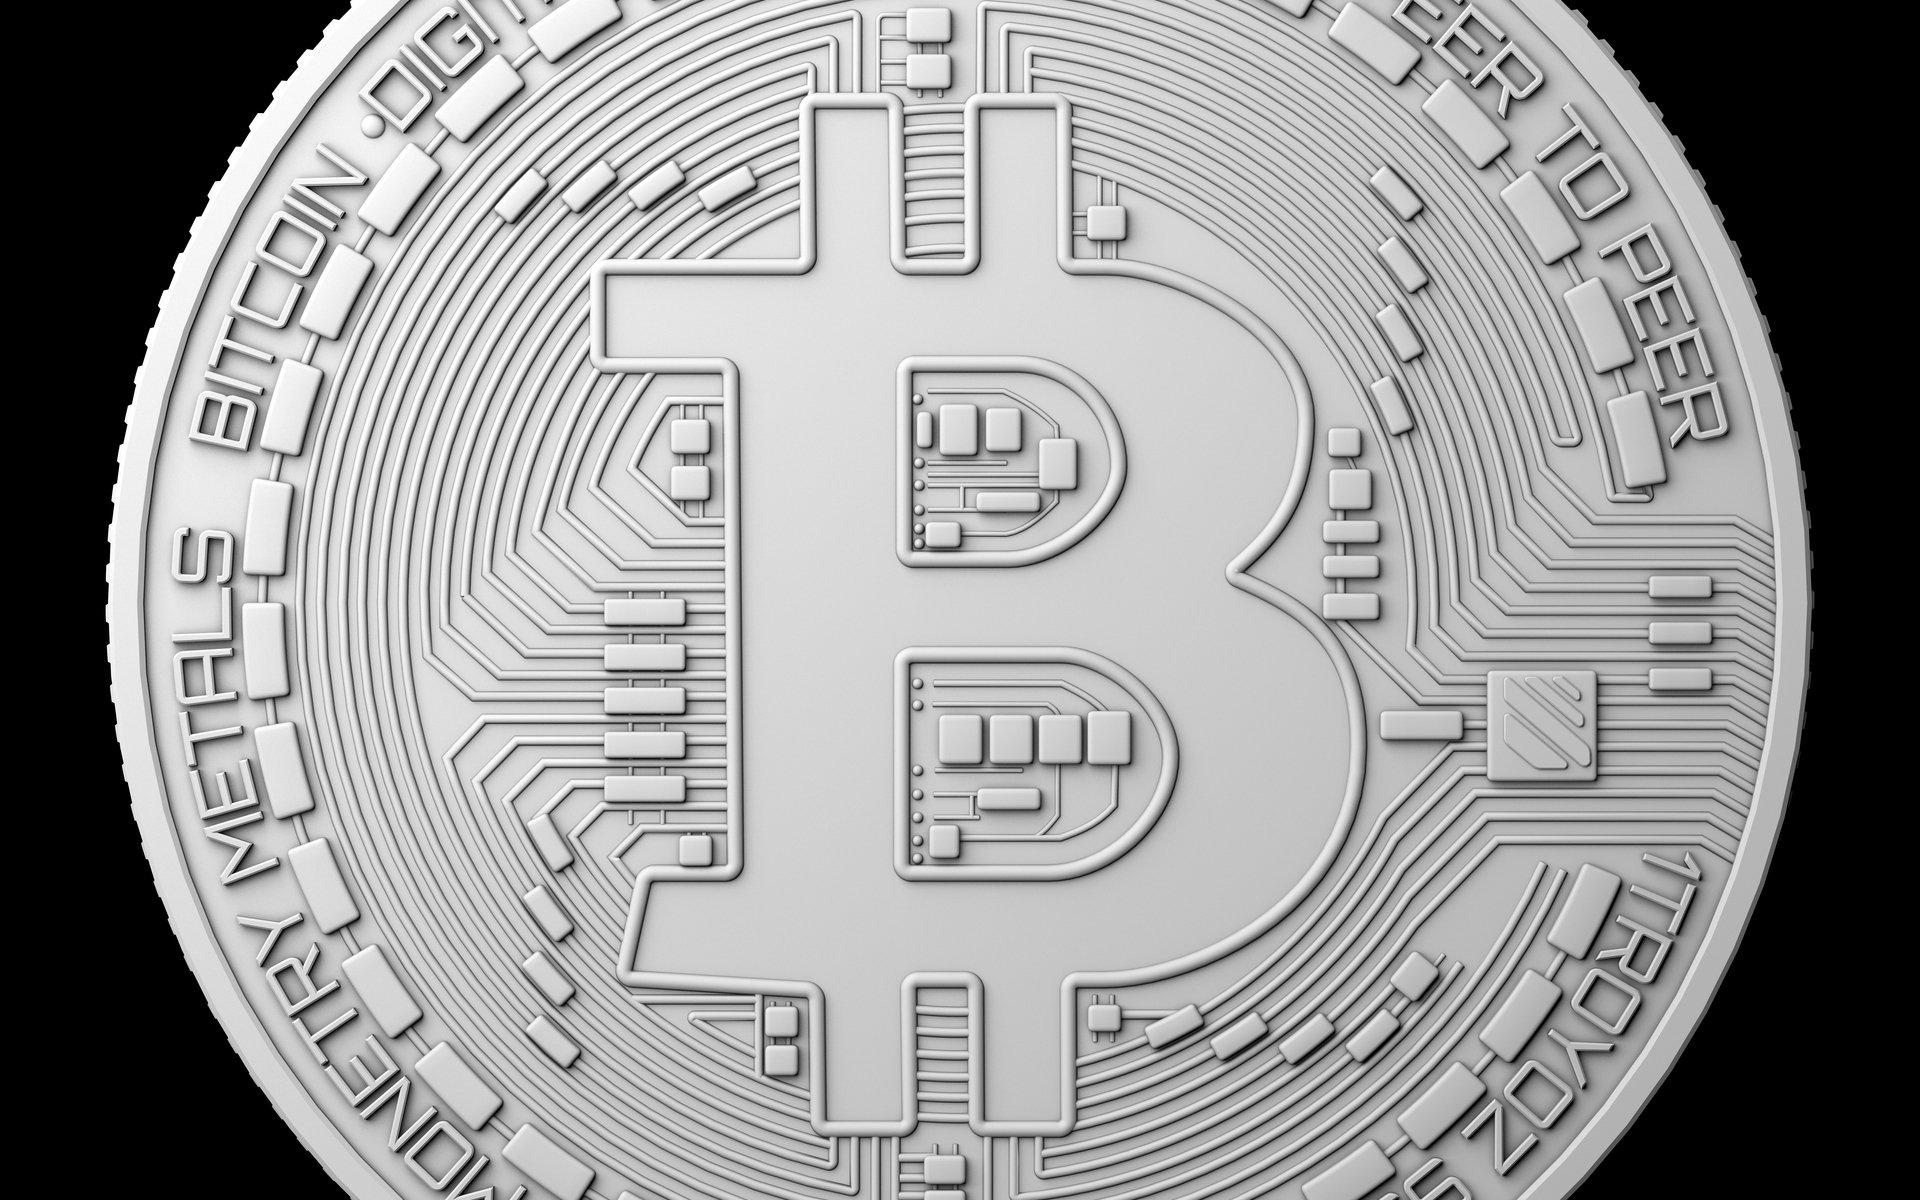 Grayscale Tempts Investors with Zero-Premium Bitcoin